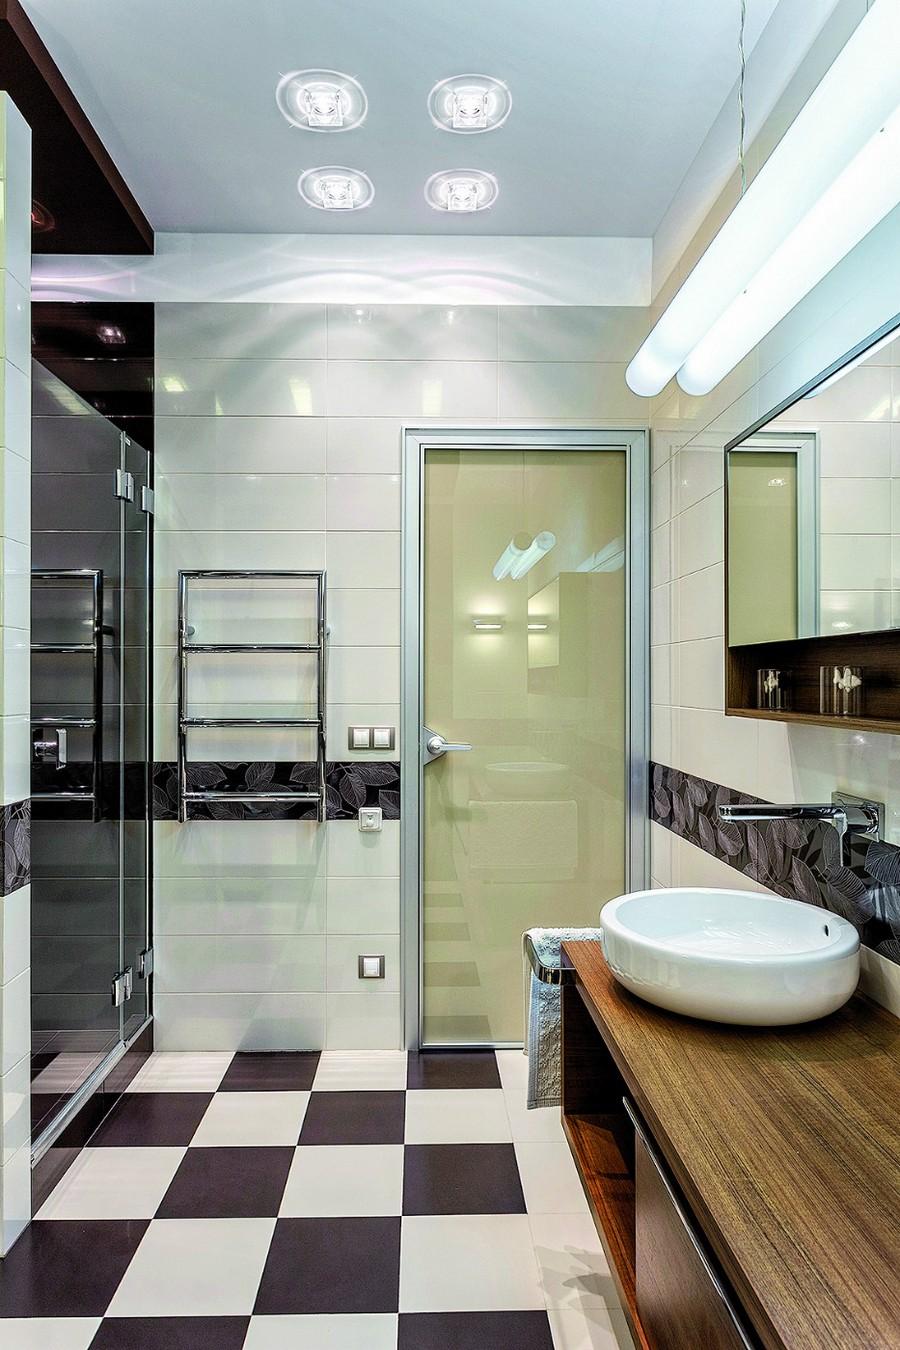 7-black-and-white-bathroom-interior-design-floor-tiles-shower-cabin-towel-drying-radiator-wooden-wash-basin-cabinet-oilve-green-glass-door